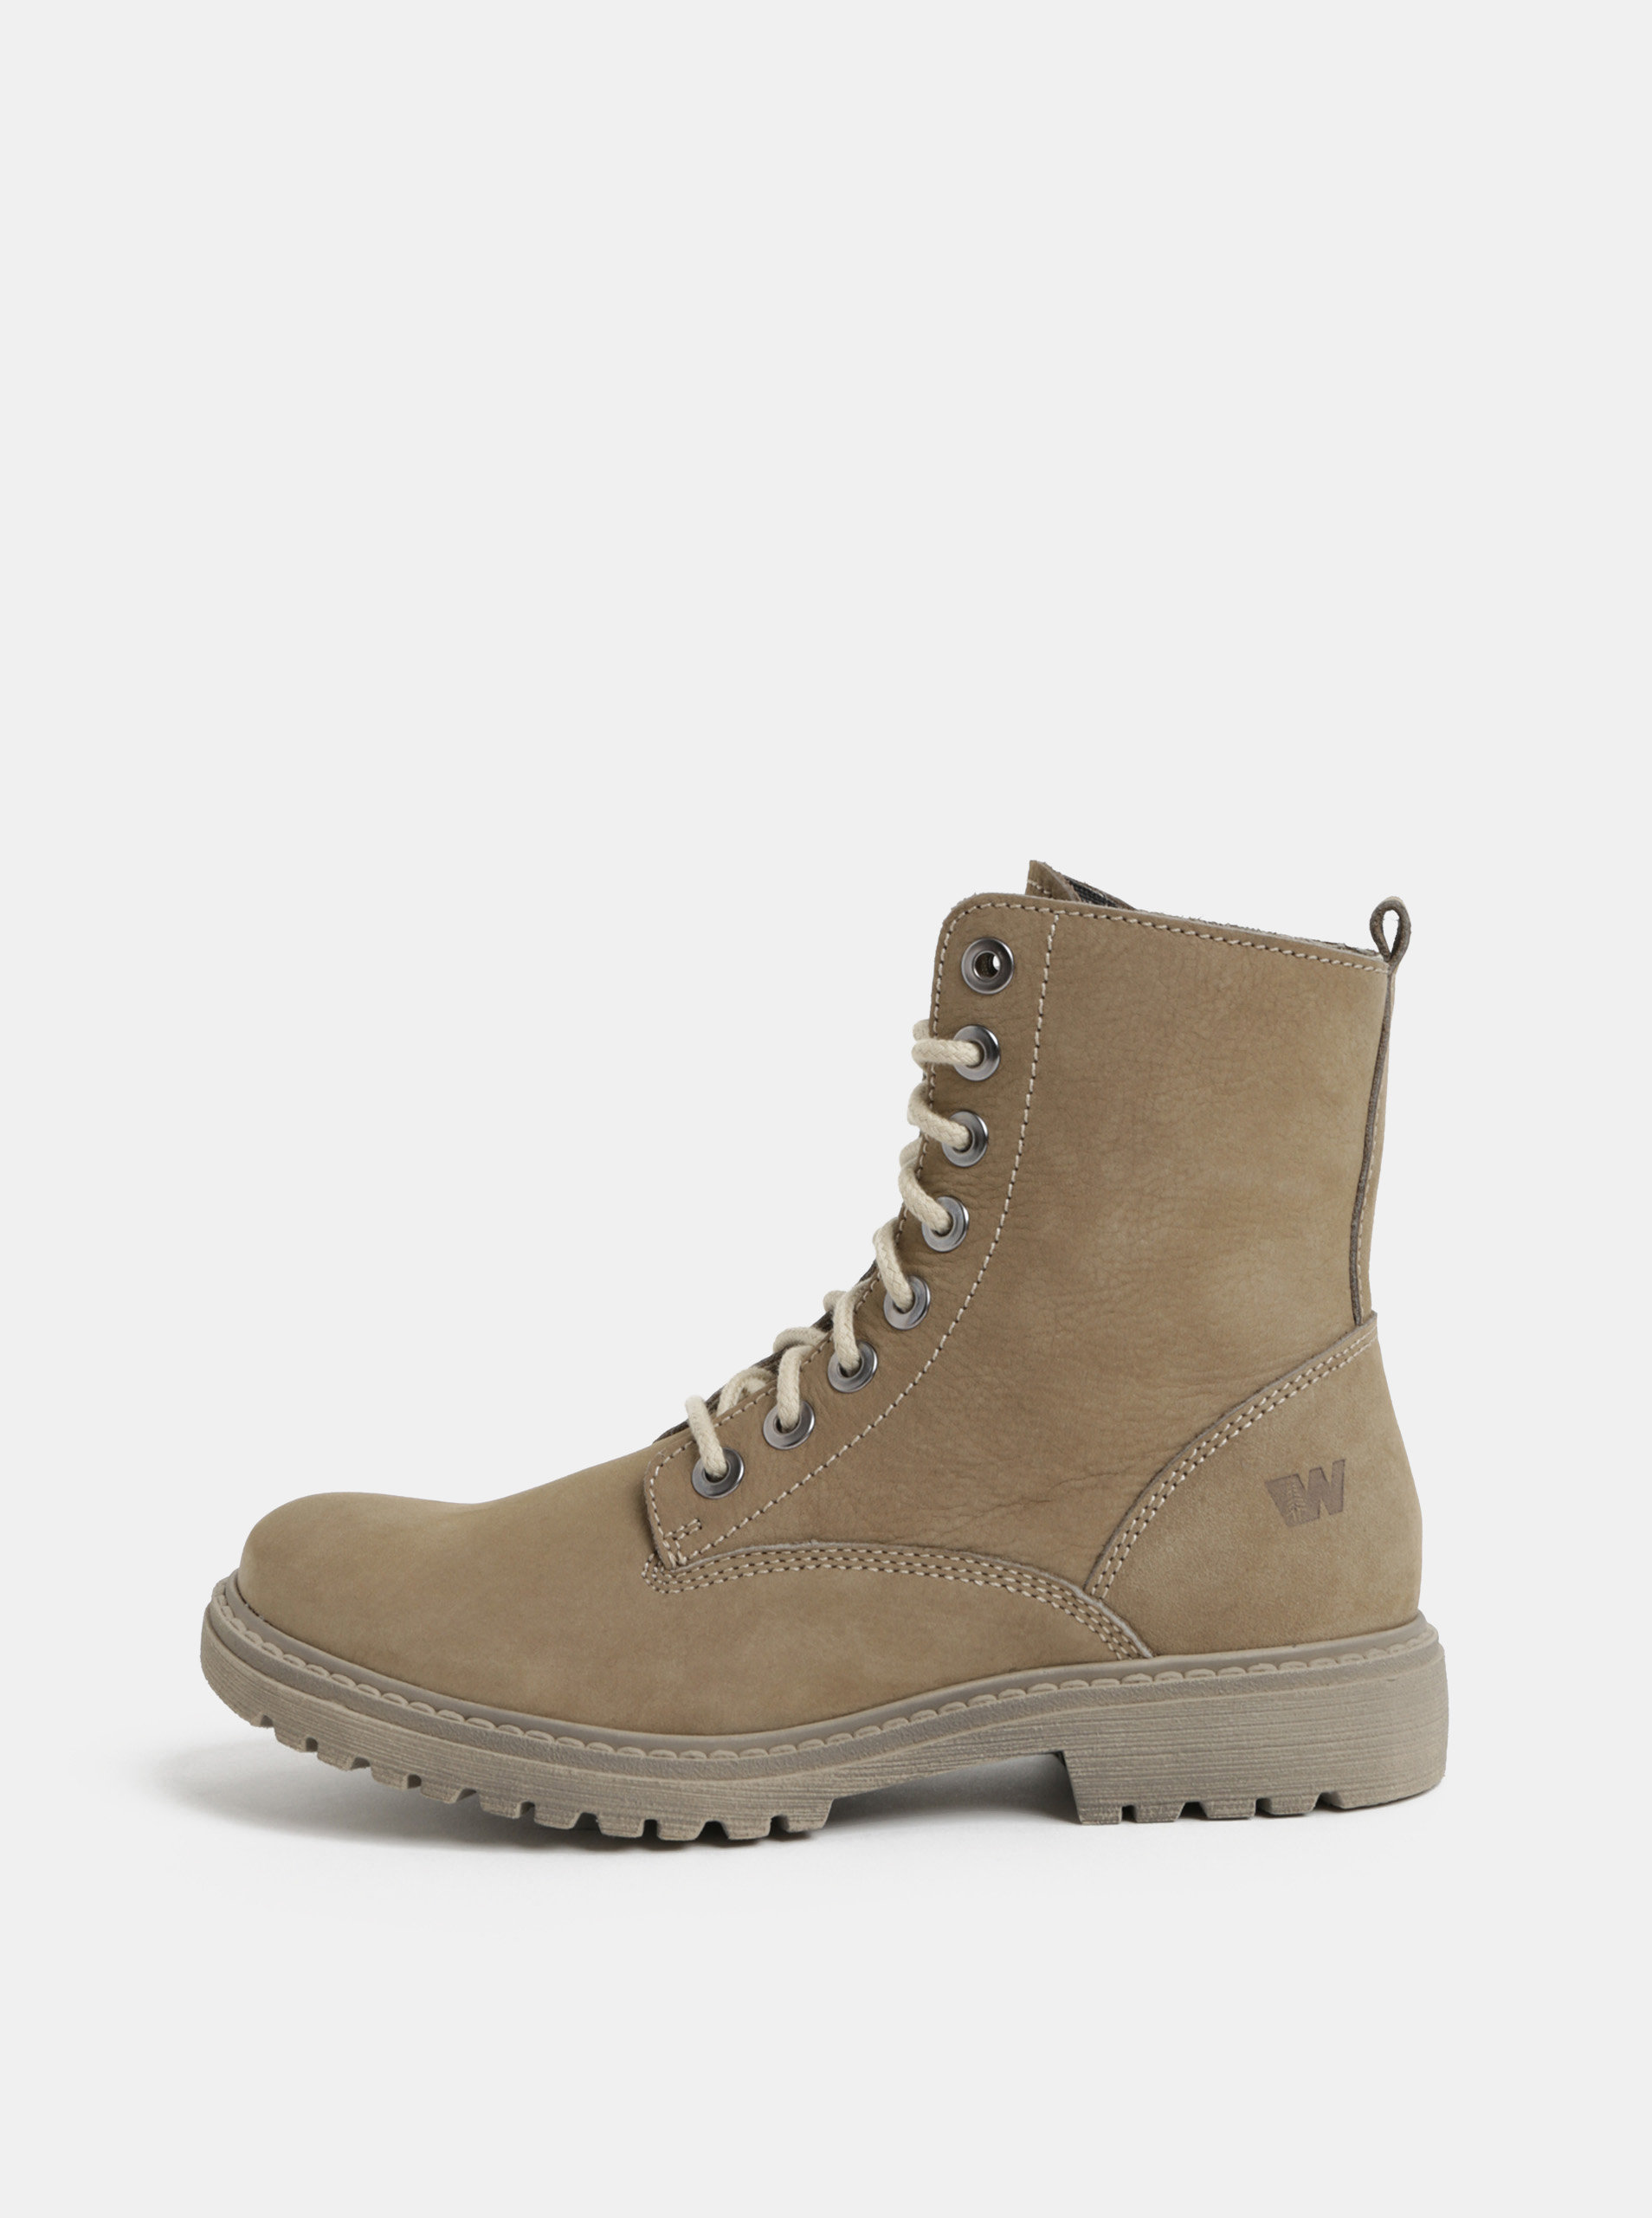 Béžové dámske kožené členkové topánky Weinbrenner ... 80b56d2b35c